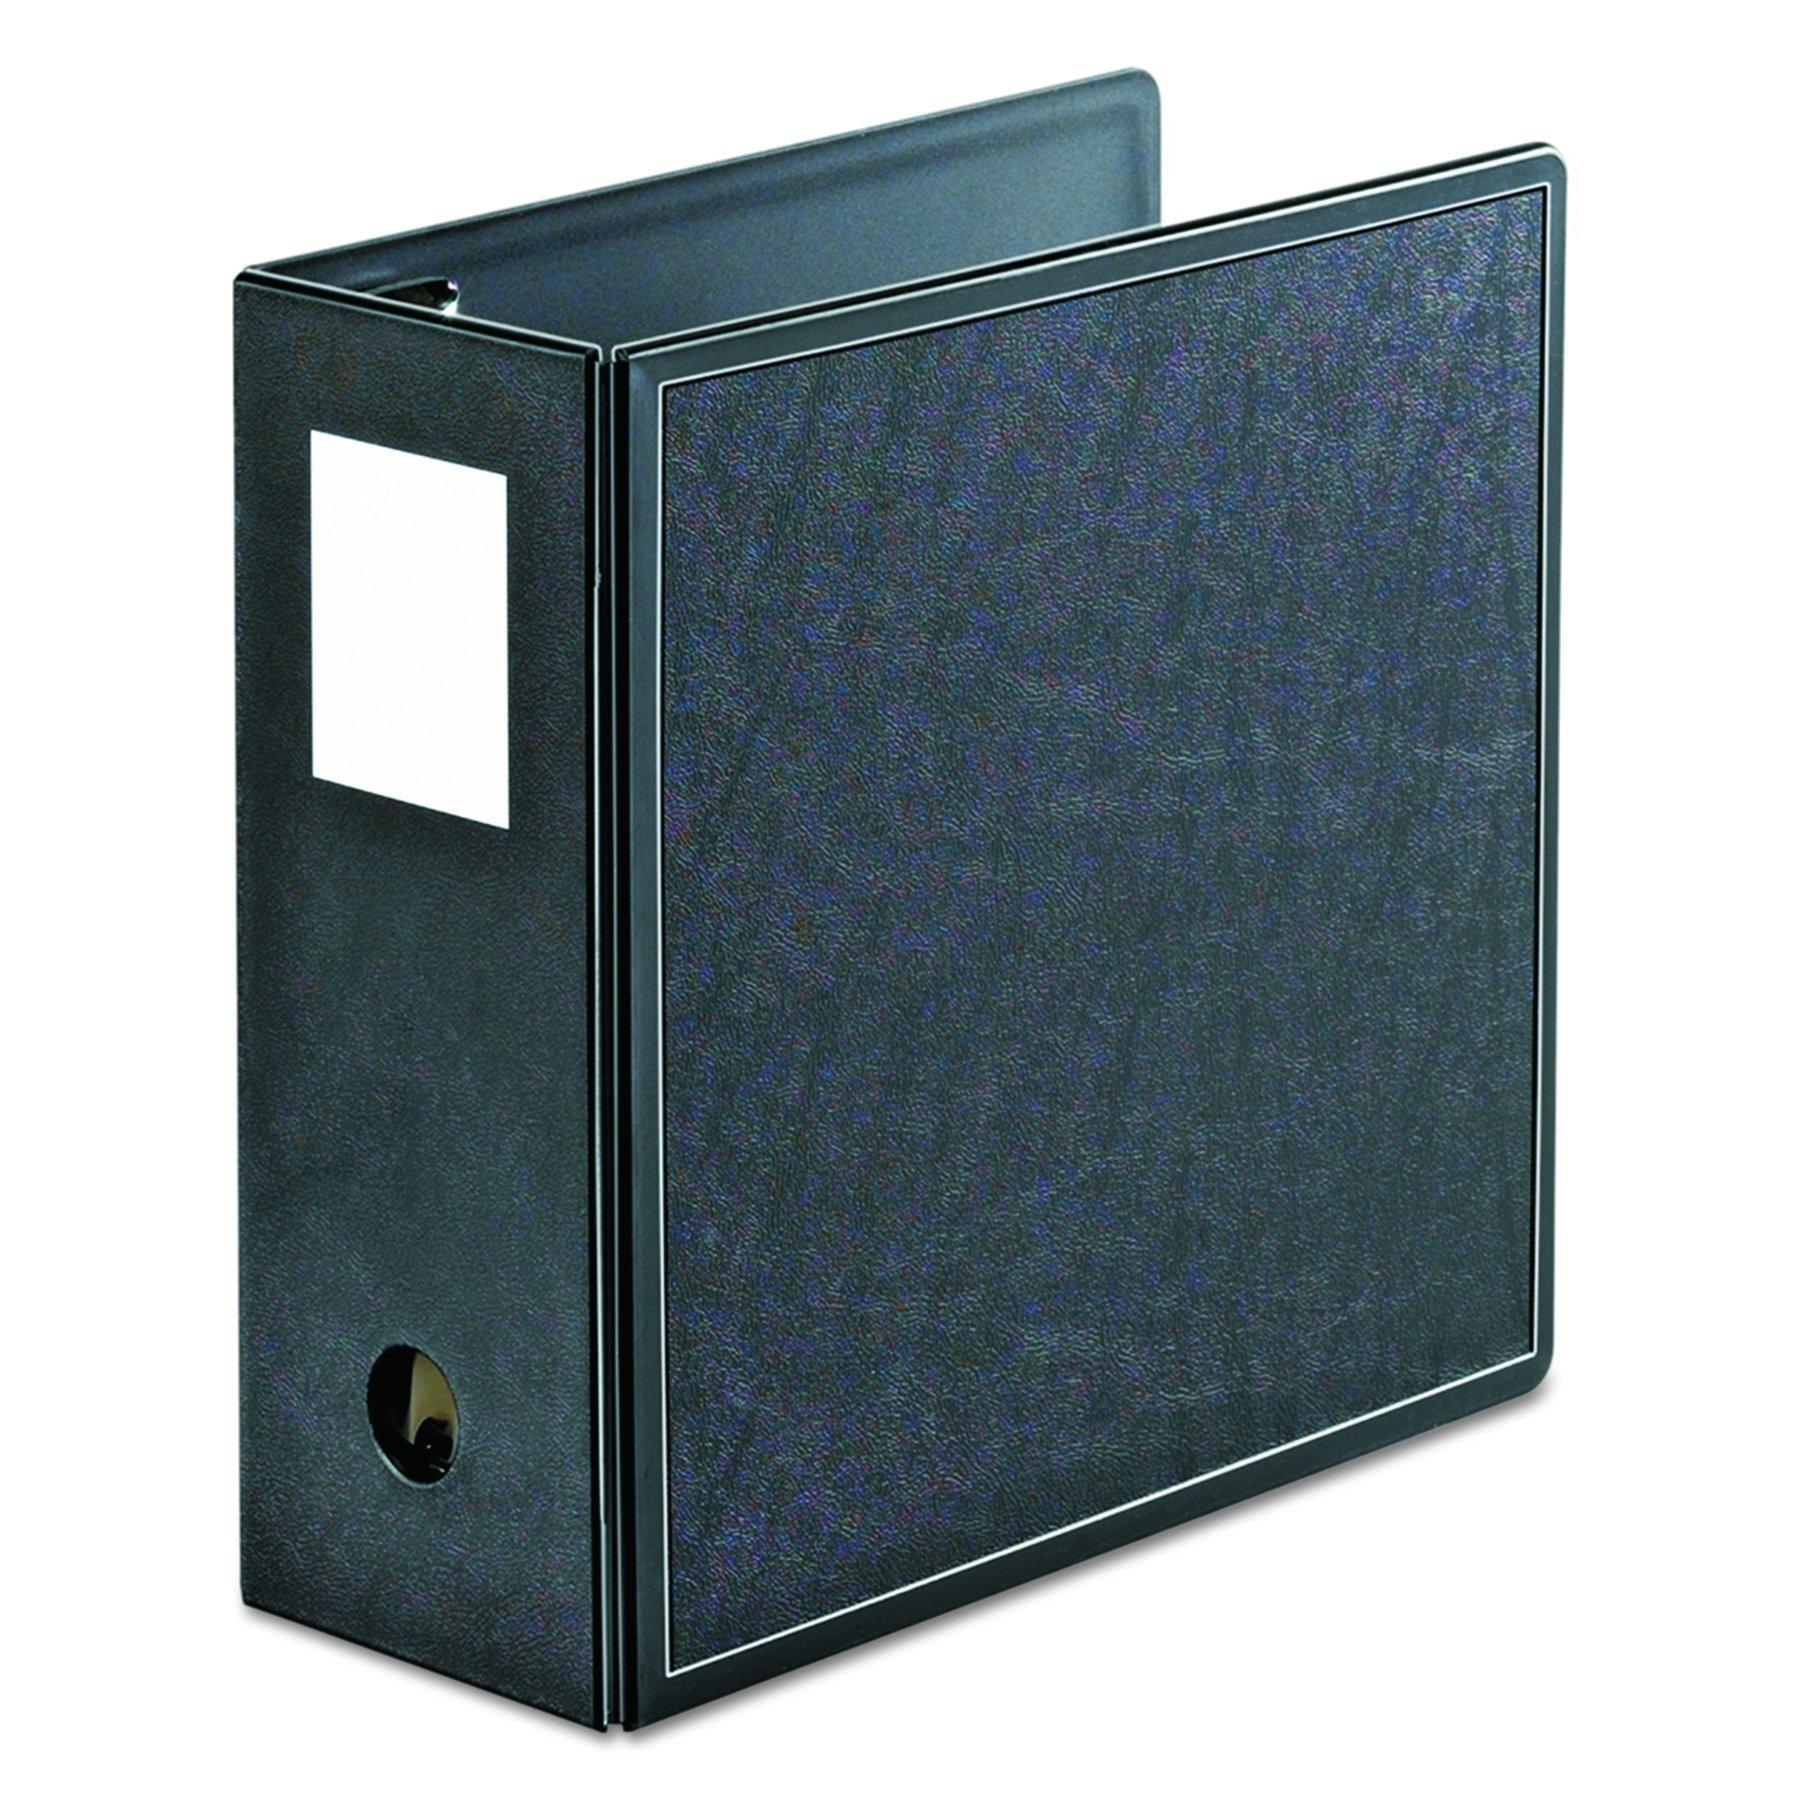 Cardinal 14052 SuperLife Easy Open Locking Slant-D Ring Binder, 5'' Cap, 11 x 8 1/2, Black